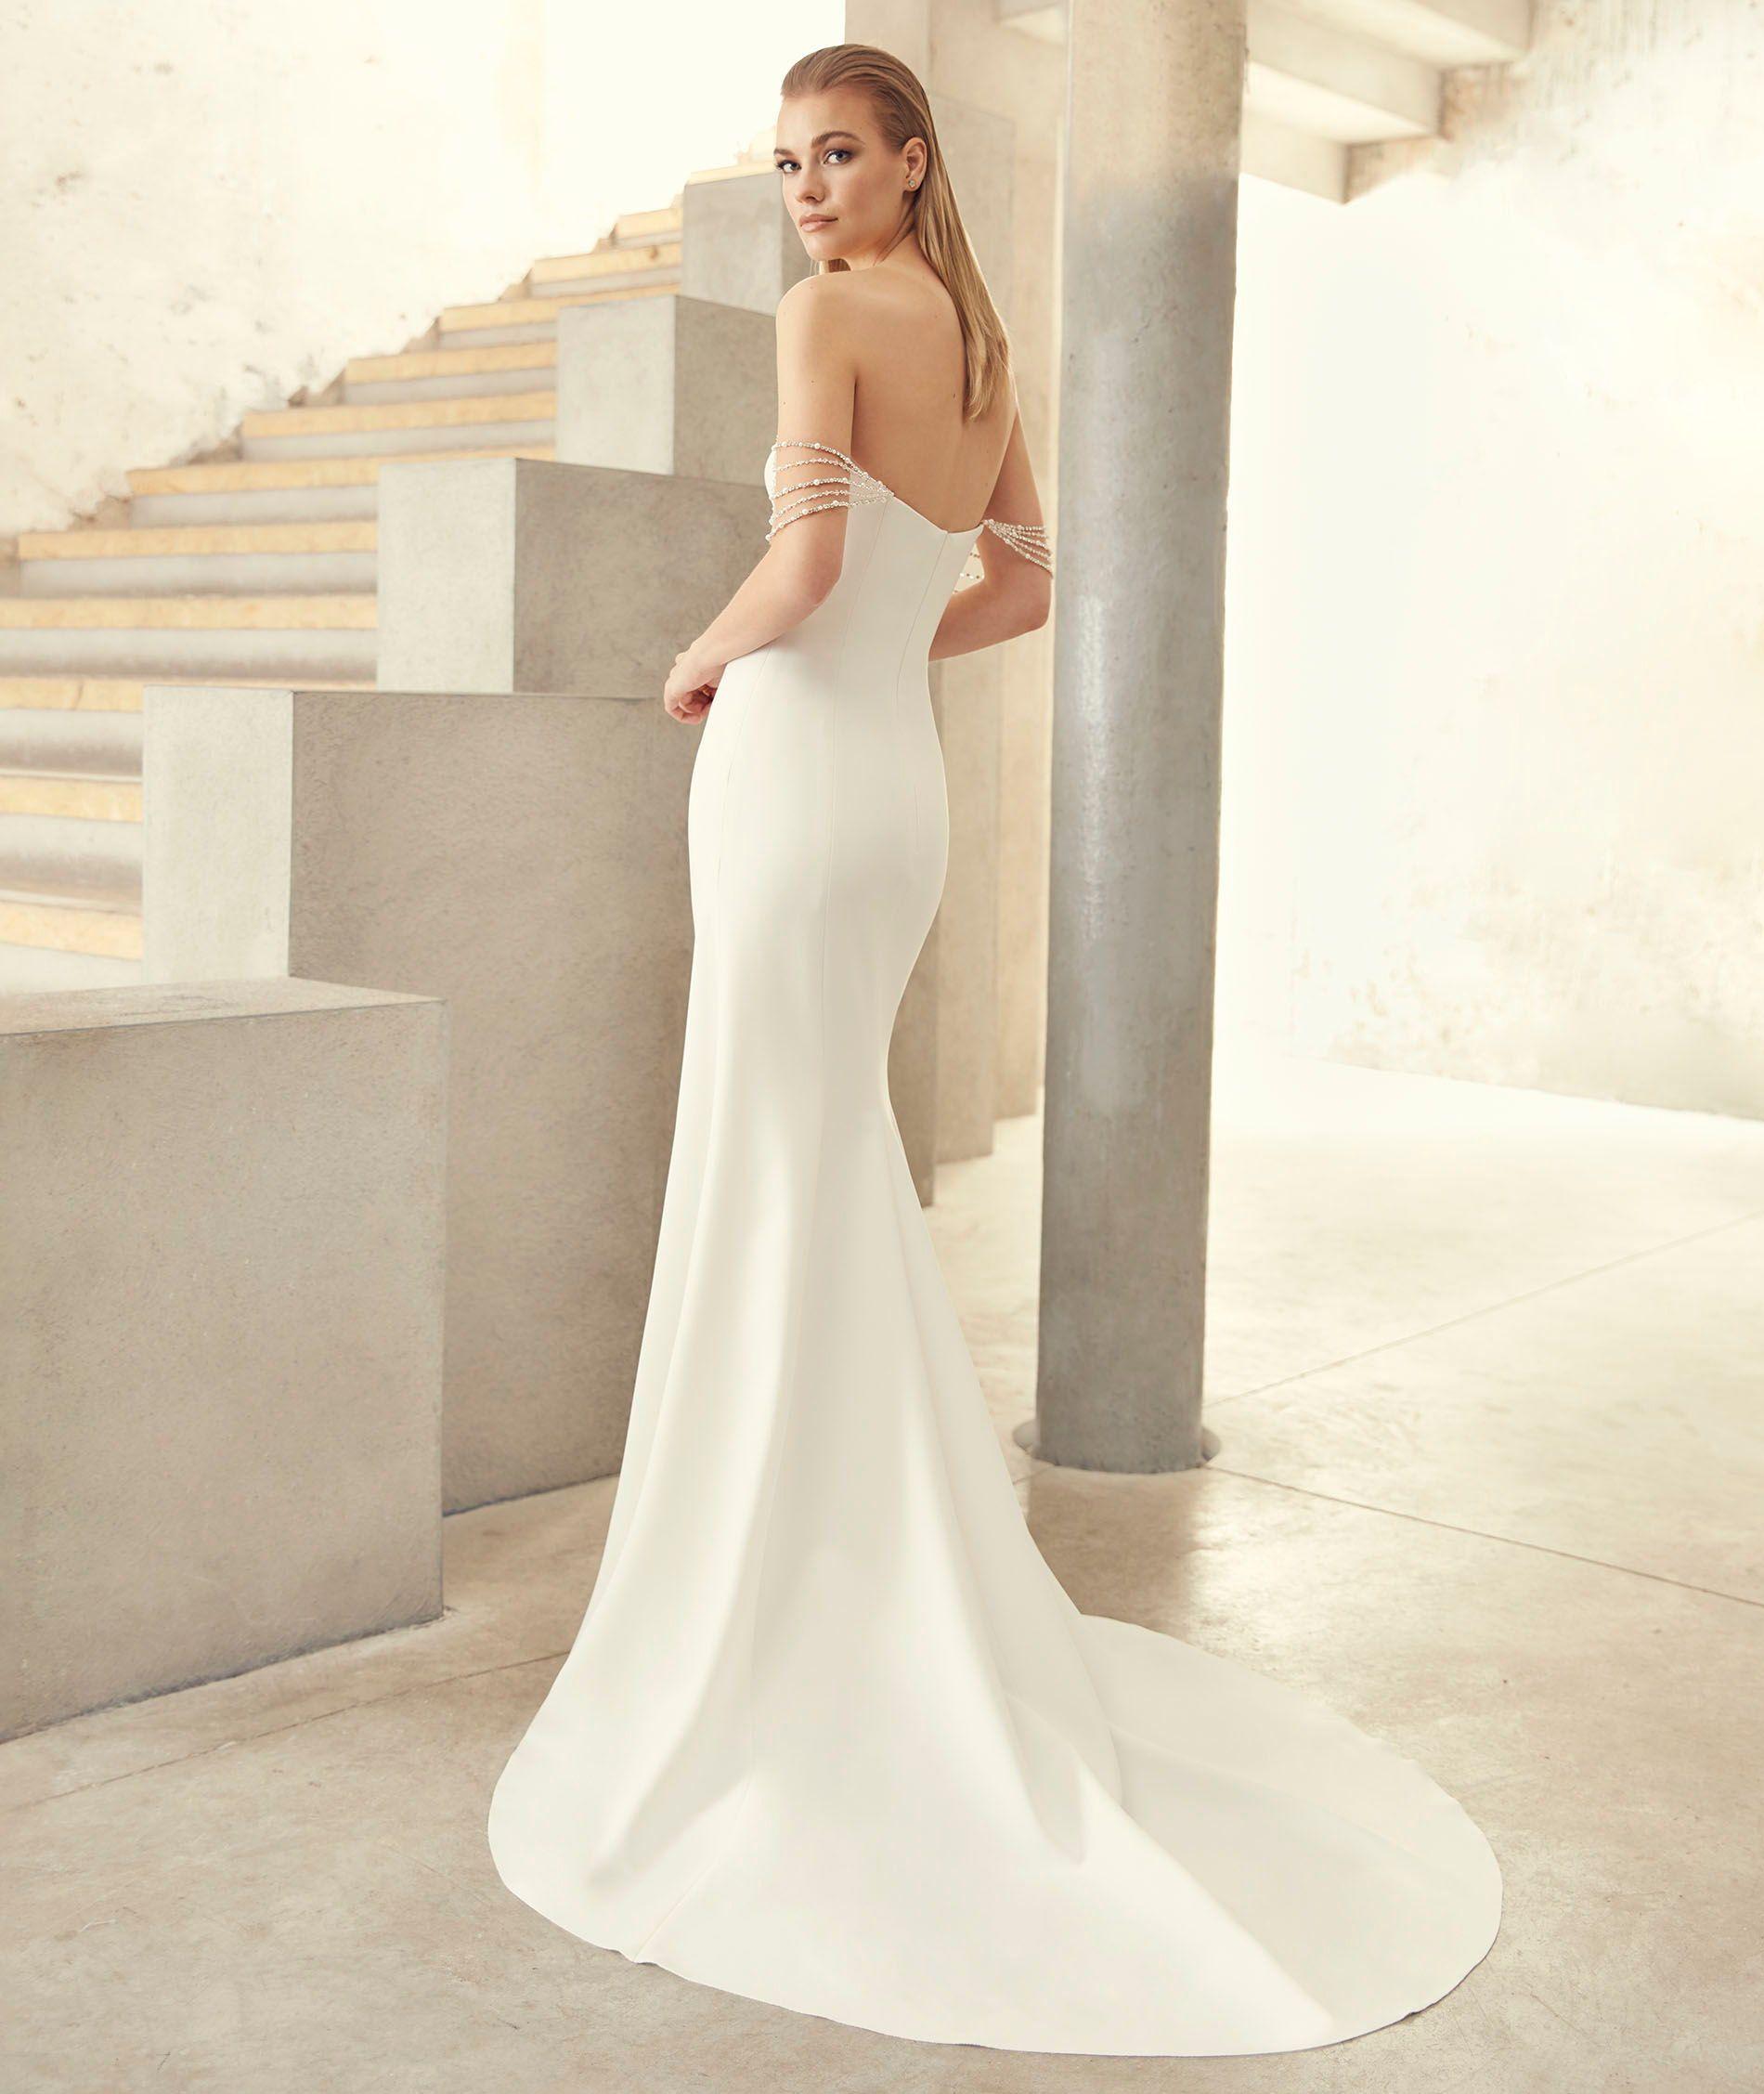 Diane Gown New At Jessica Haley Bridal In Rye Ny Wedding Dresses Mermaid Wedding Dress Wedding Dress Shopping [ 2255 x 1900 Pixel ]